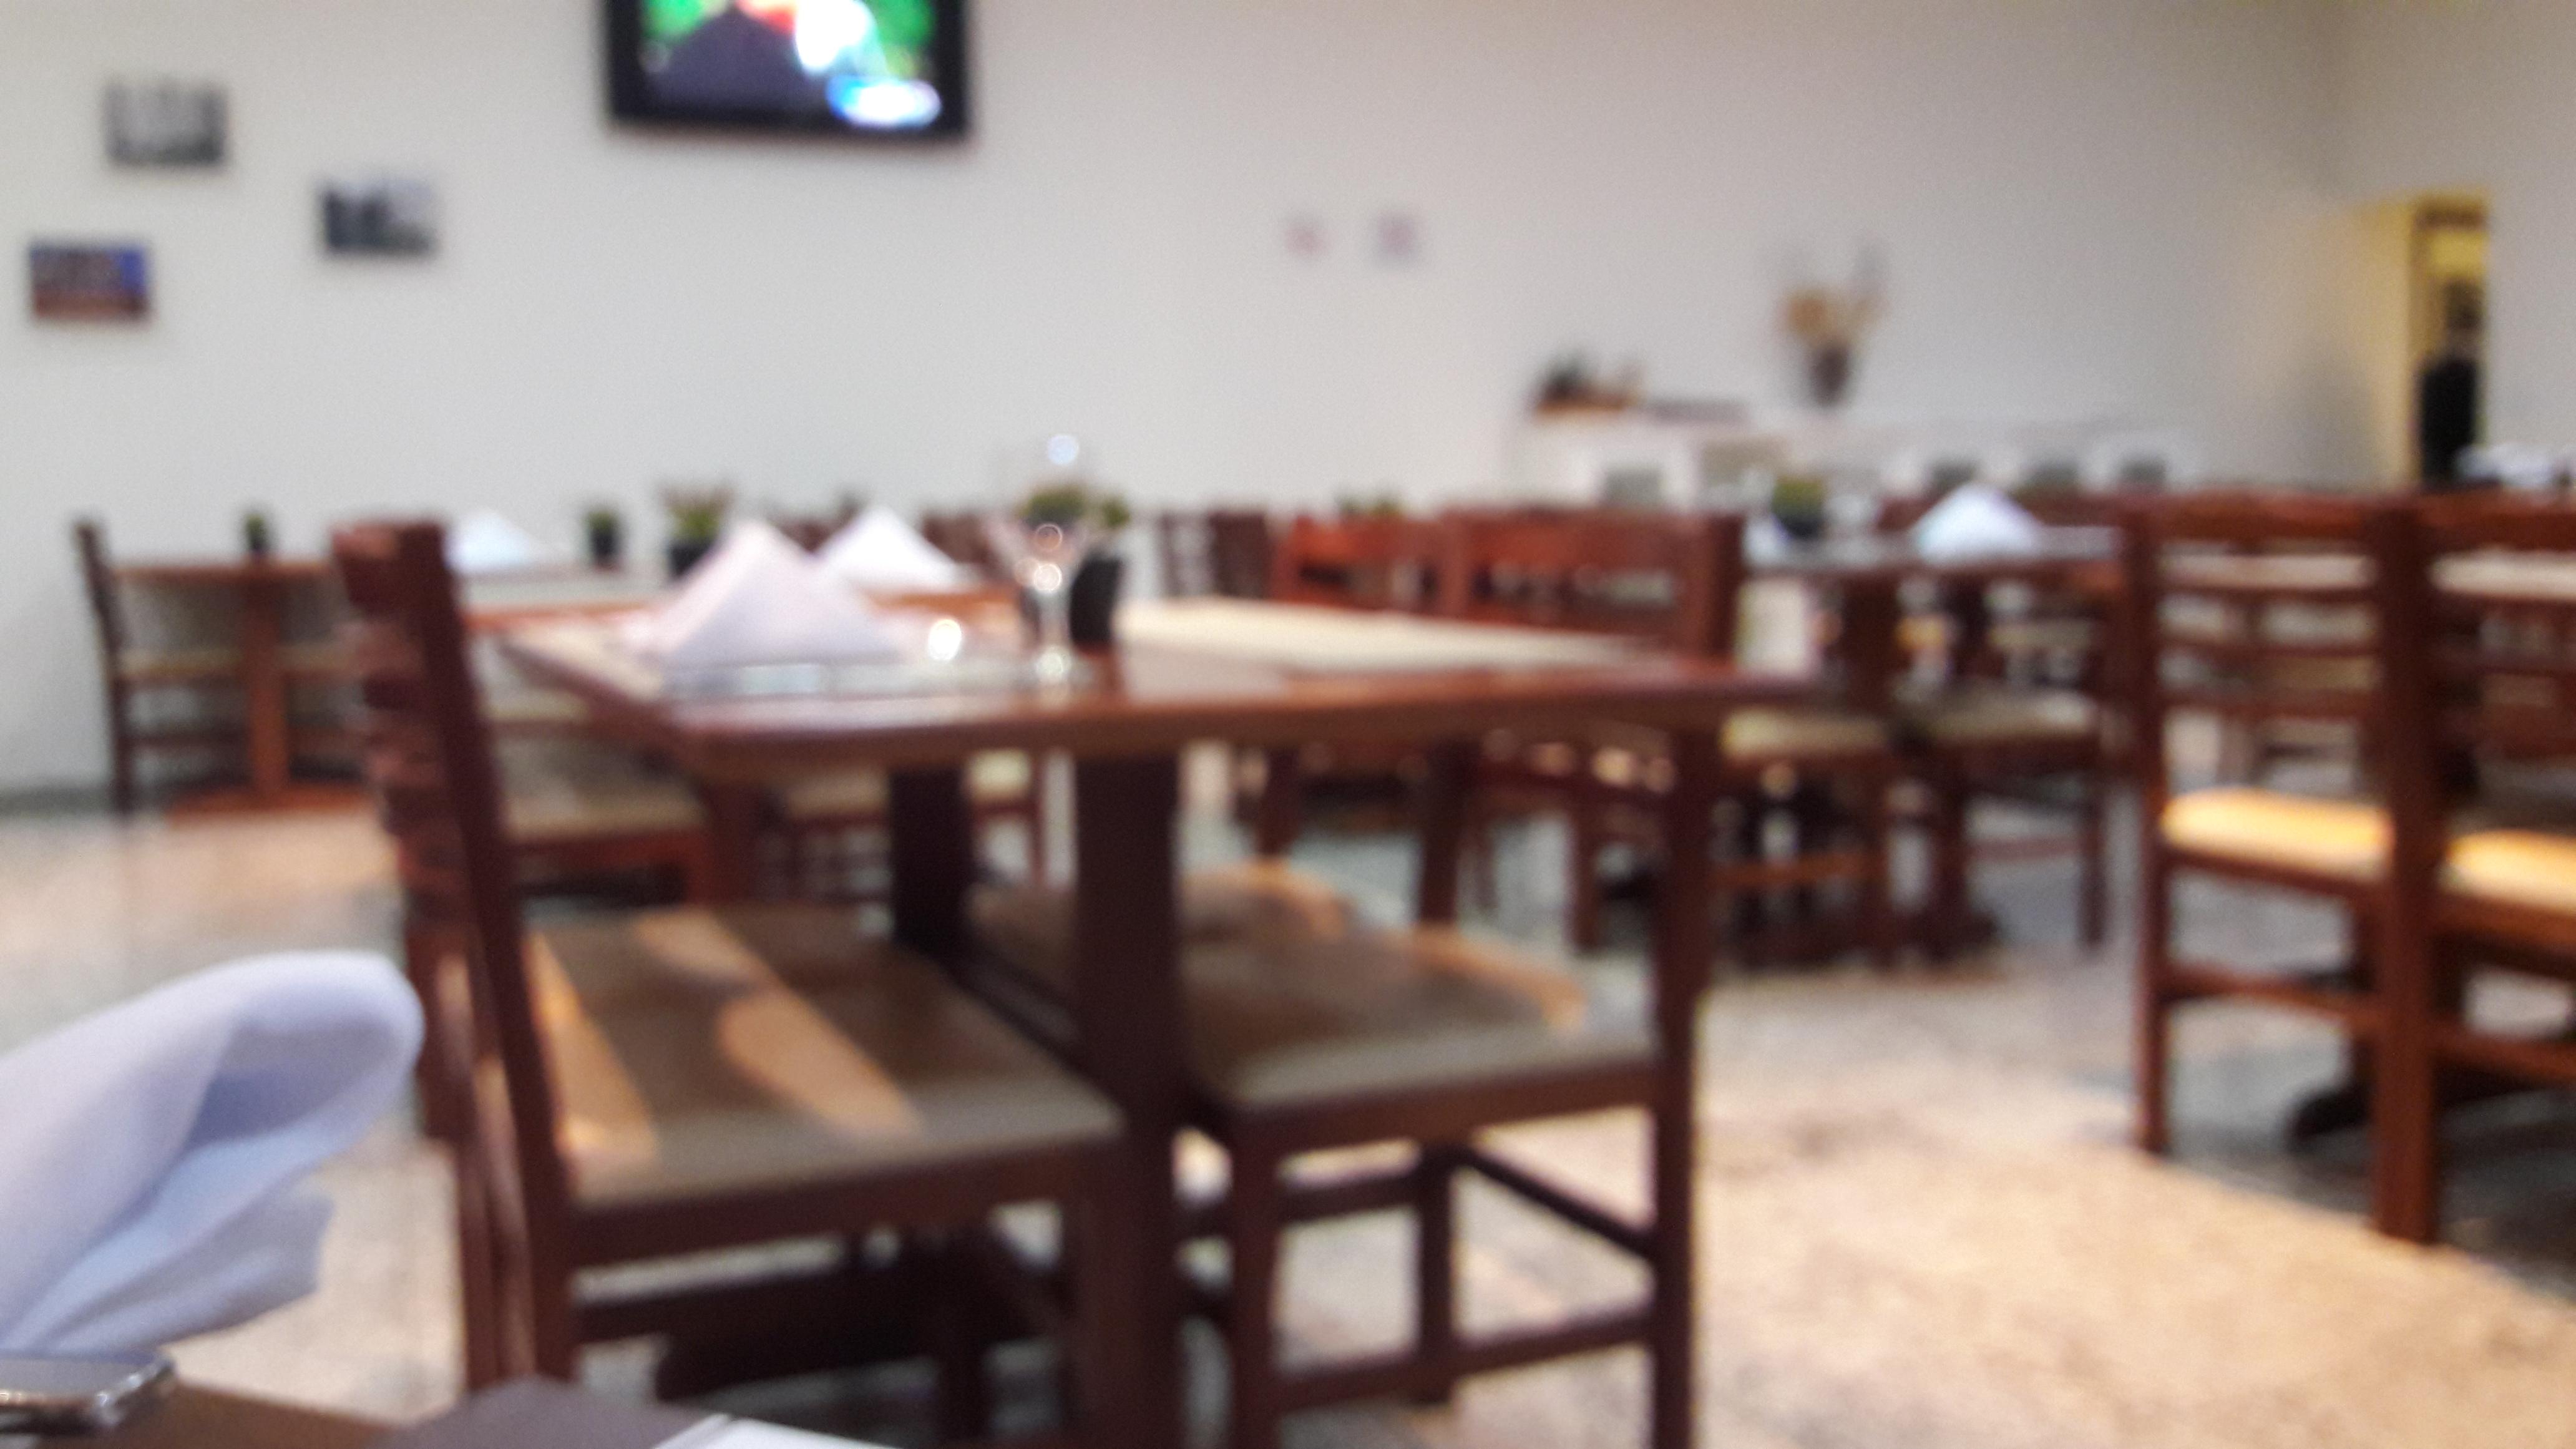 vinhedo sp plaza hotel restaurant gala may17